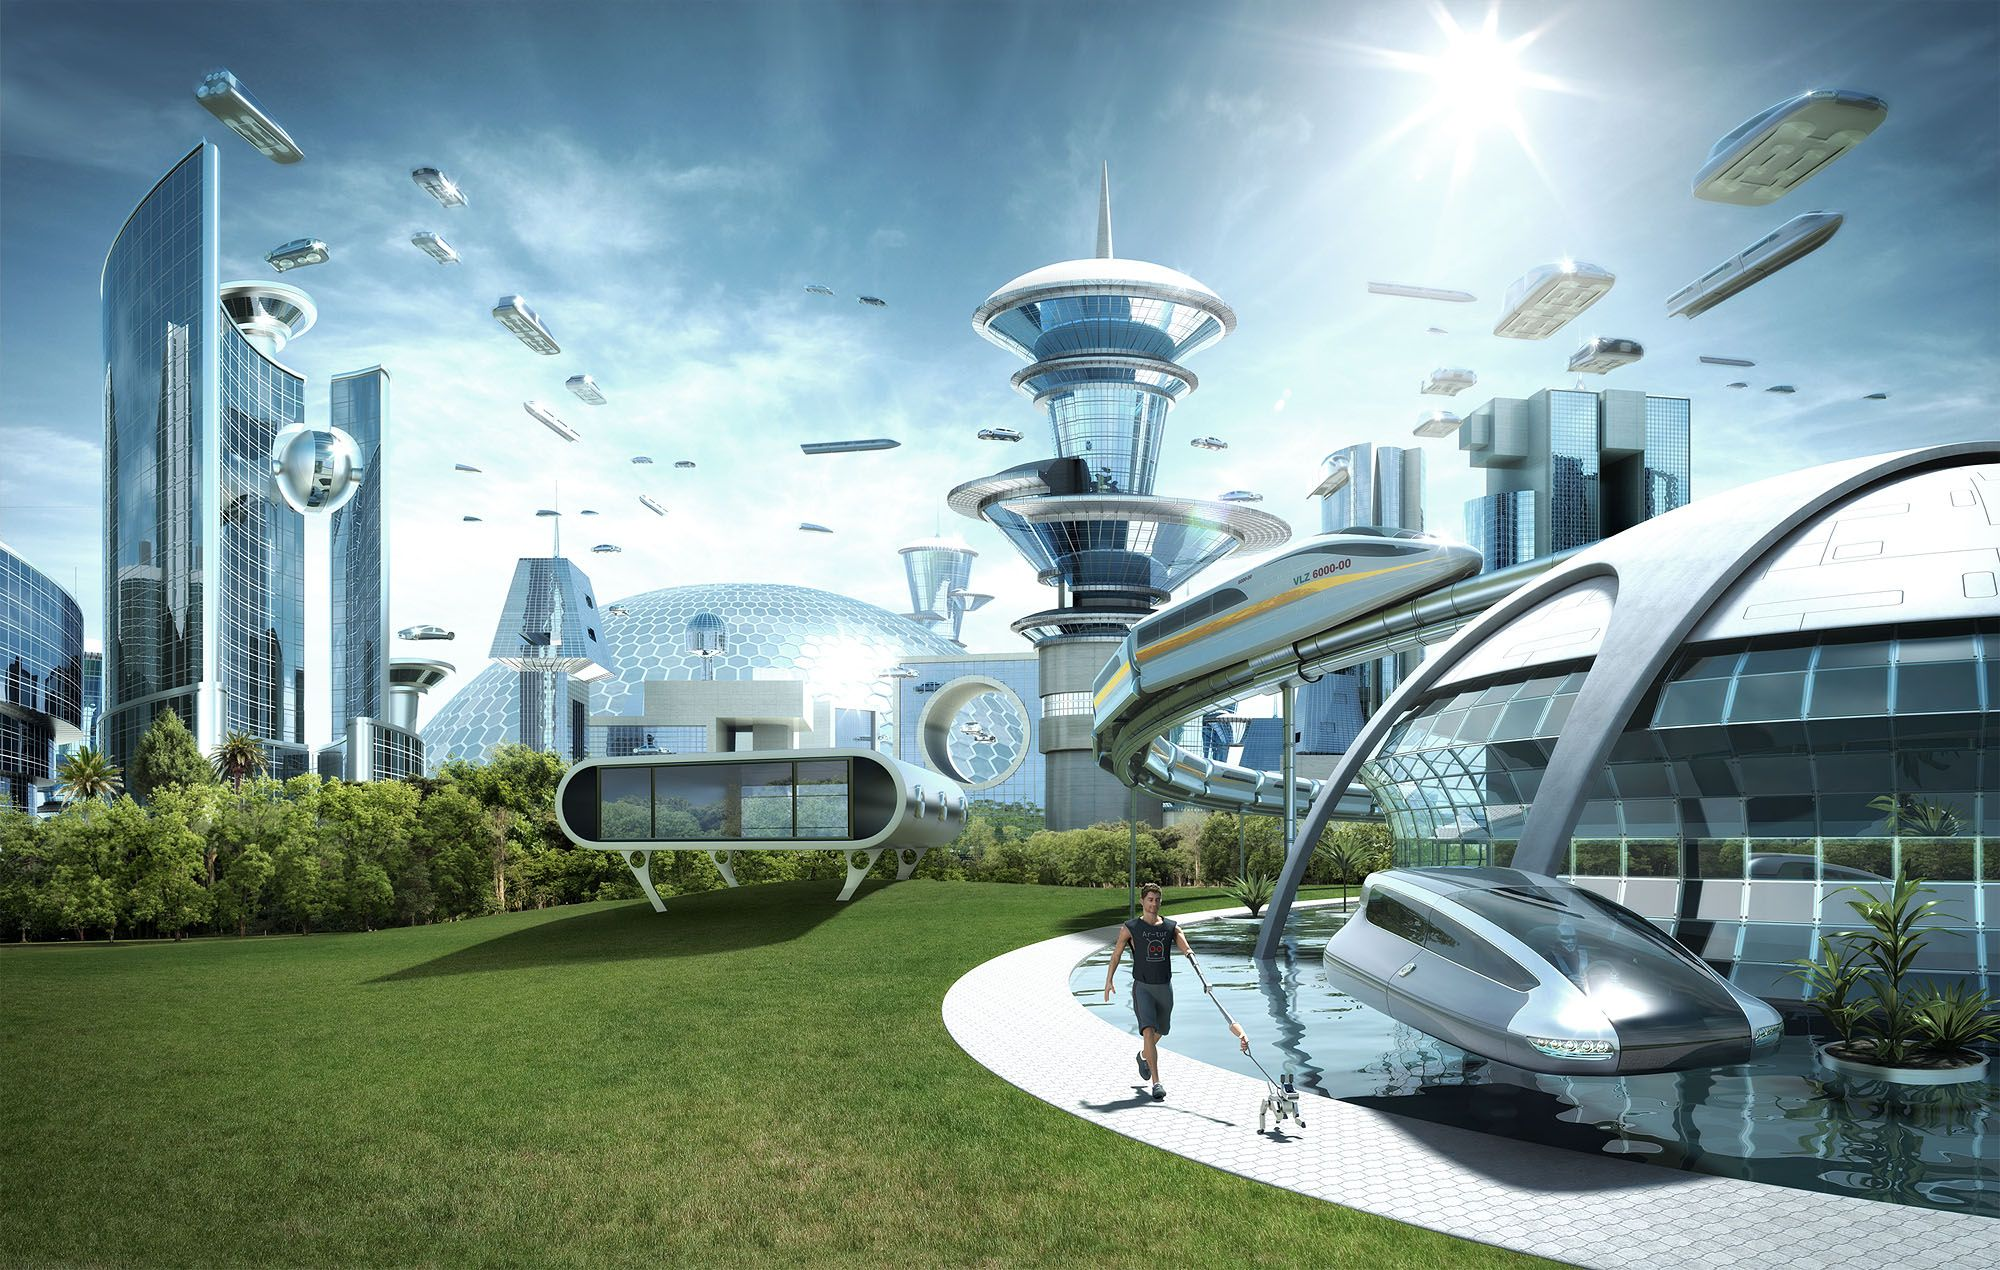 futuristic sci-fi city cities wallpaper background   Futurist ...